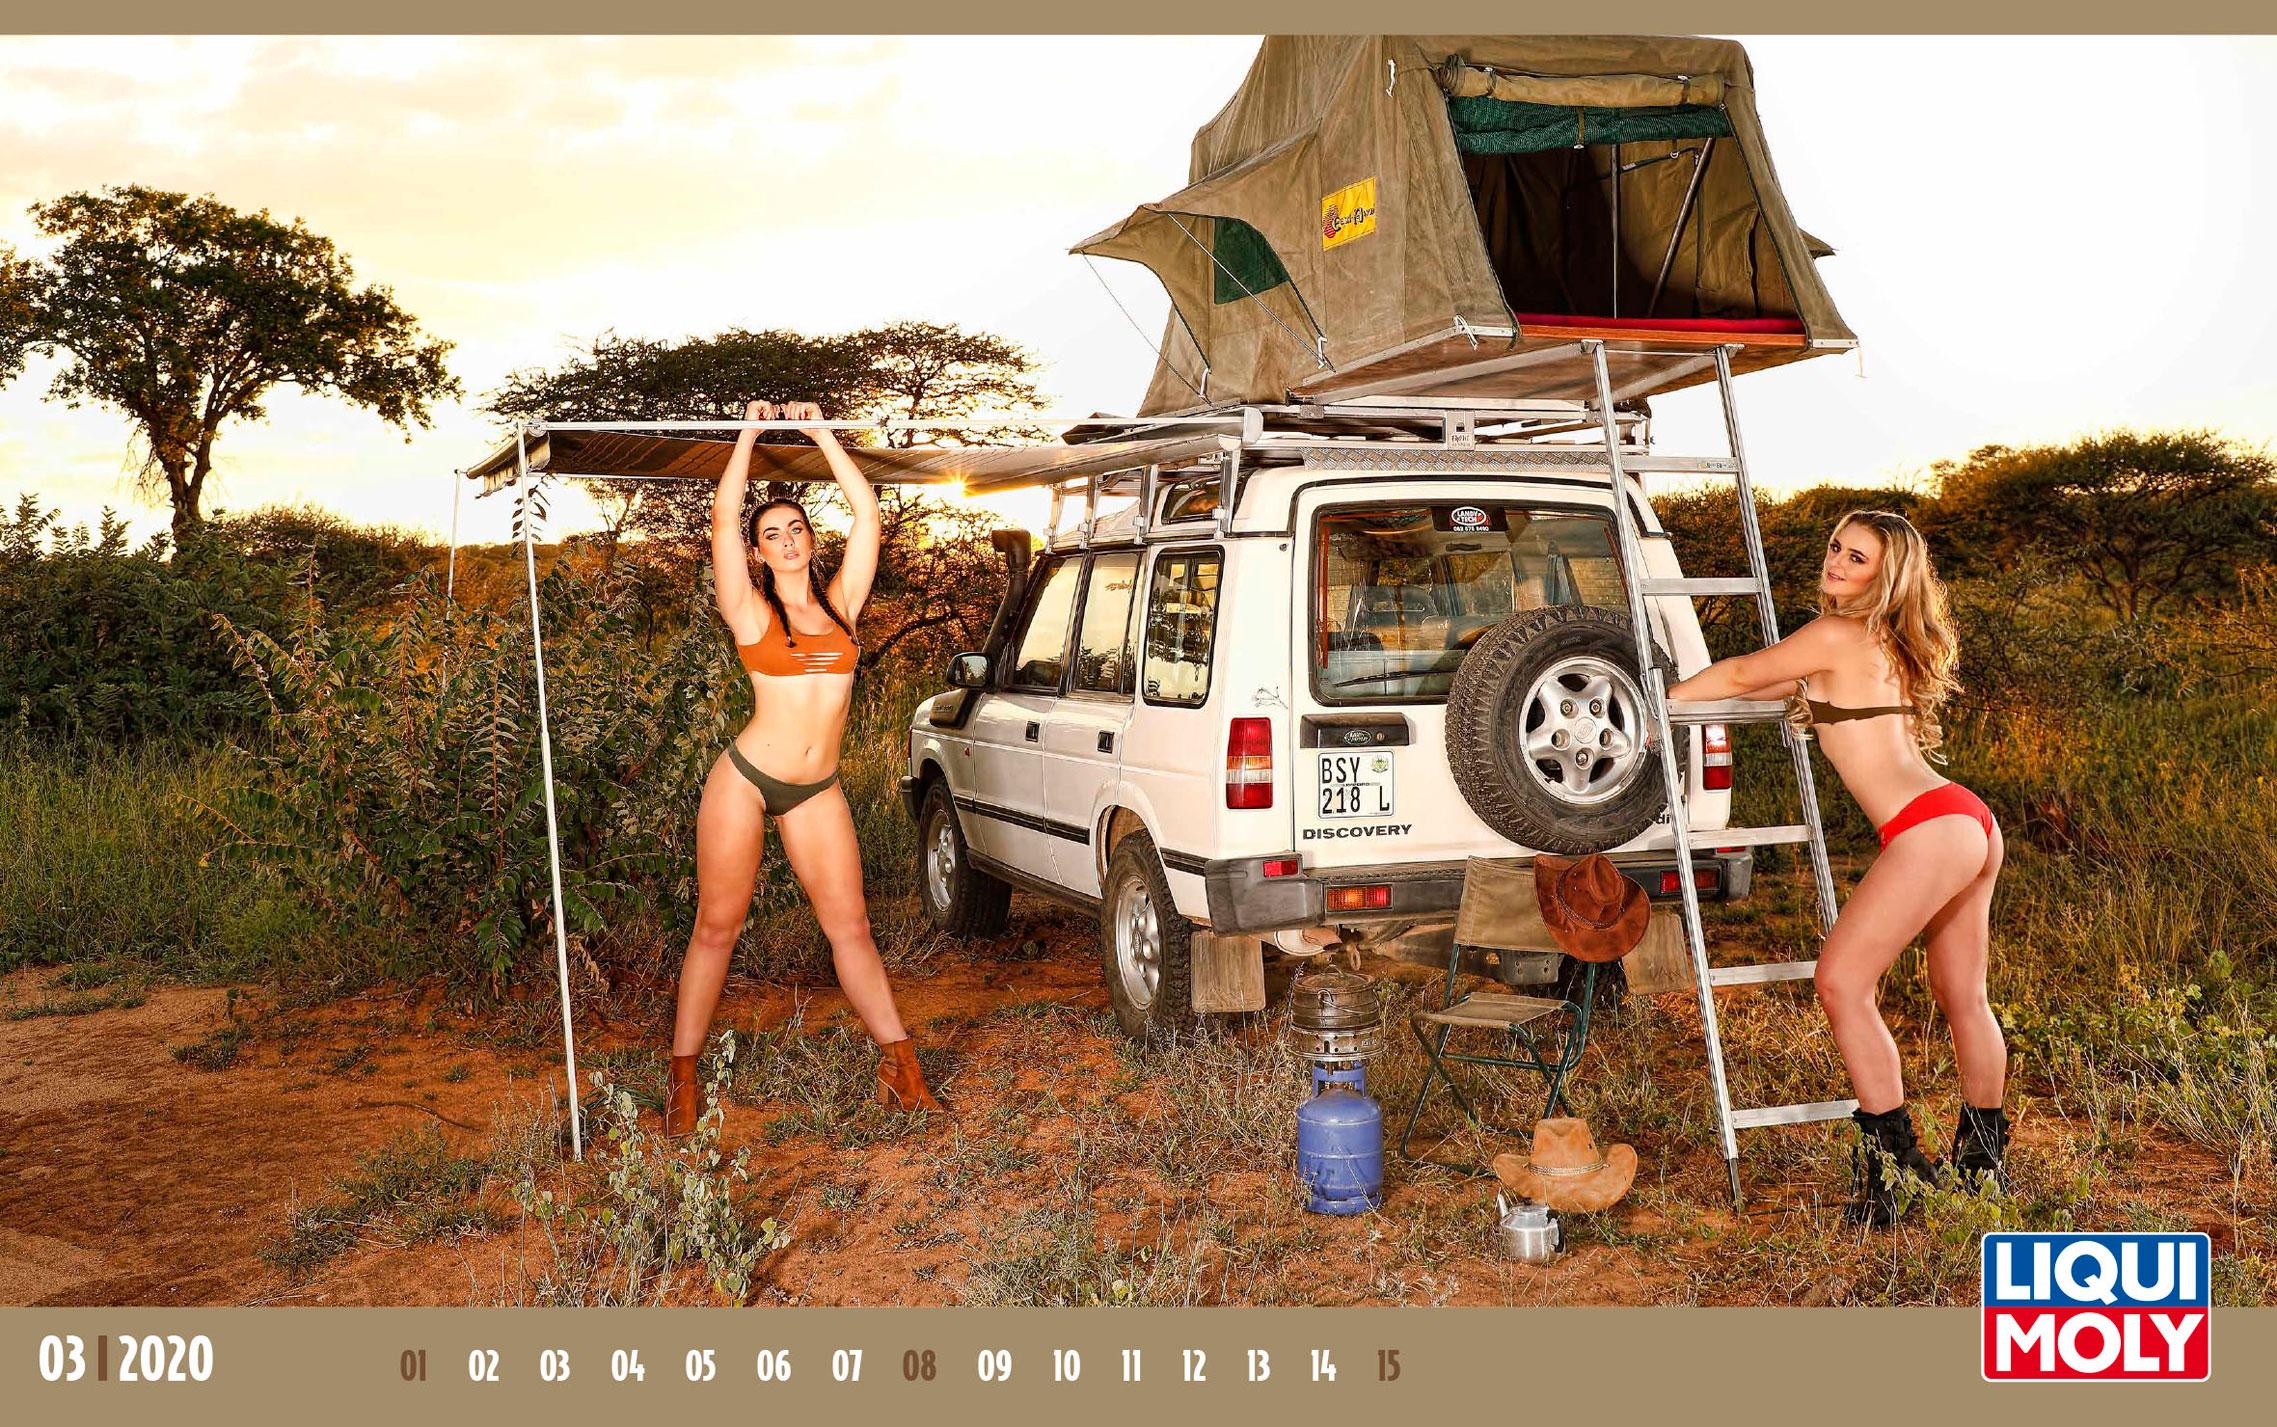 Календарь с девушками автоконцерна Liqui Moly, 2020 год / март-1